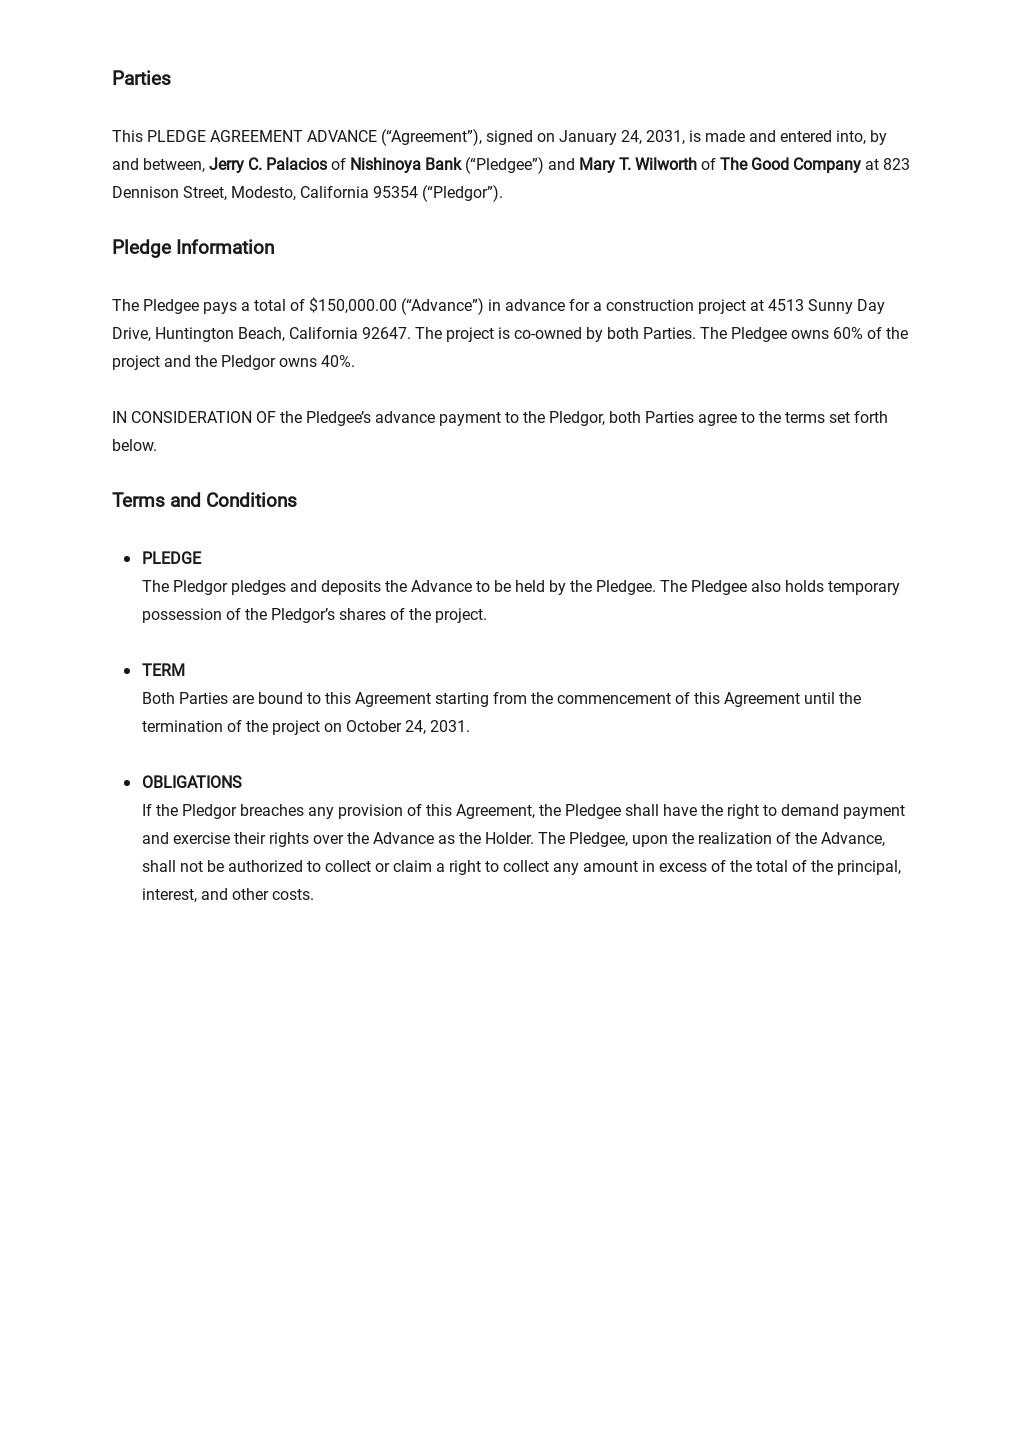 Pledge Agreement Advance Template 1.jpe